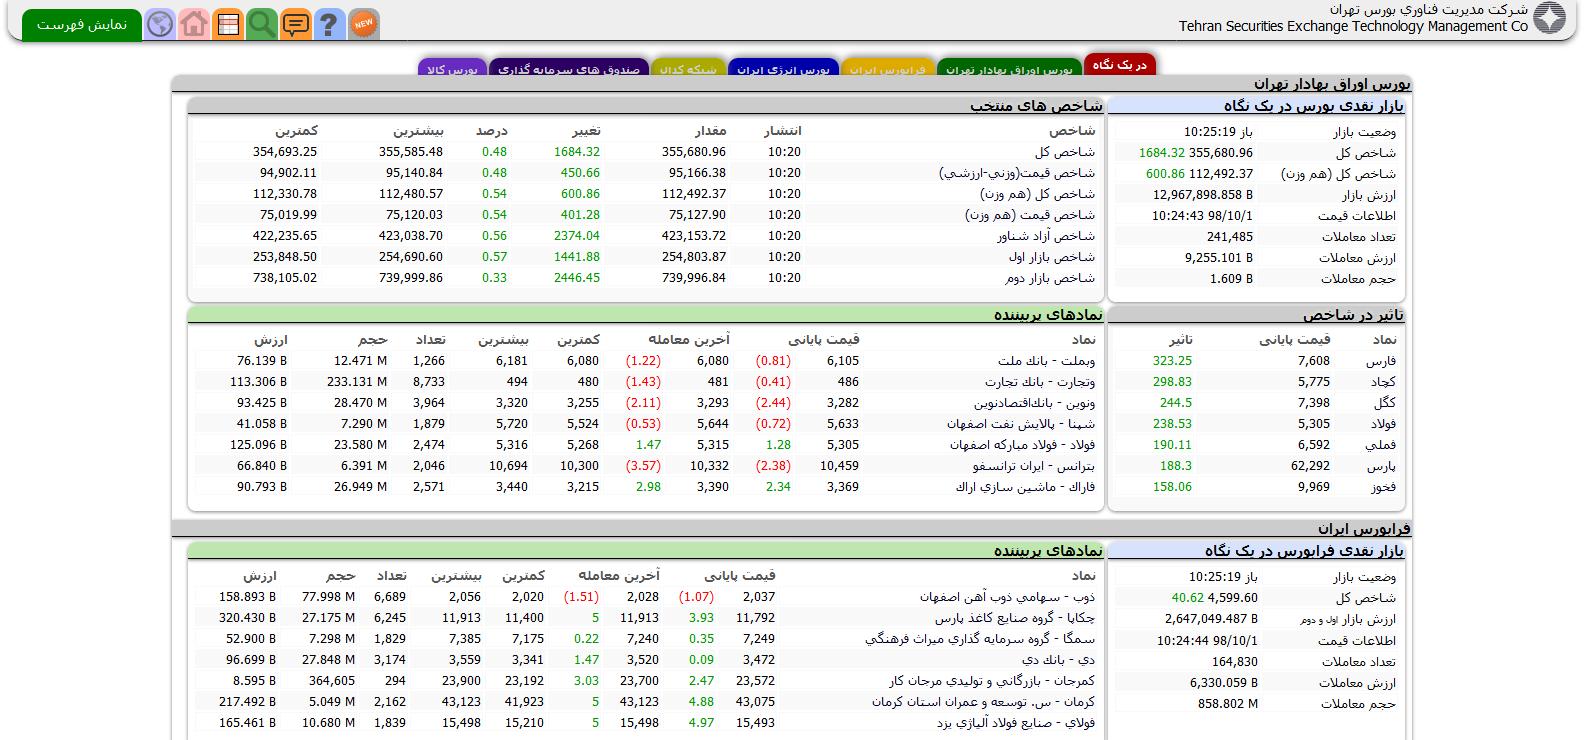 سایت شرکت مدیریت فناوری بورس تهران